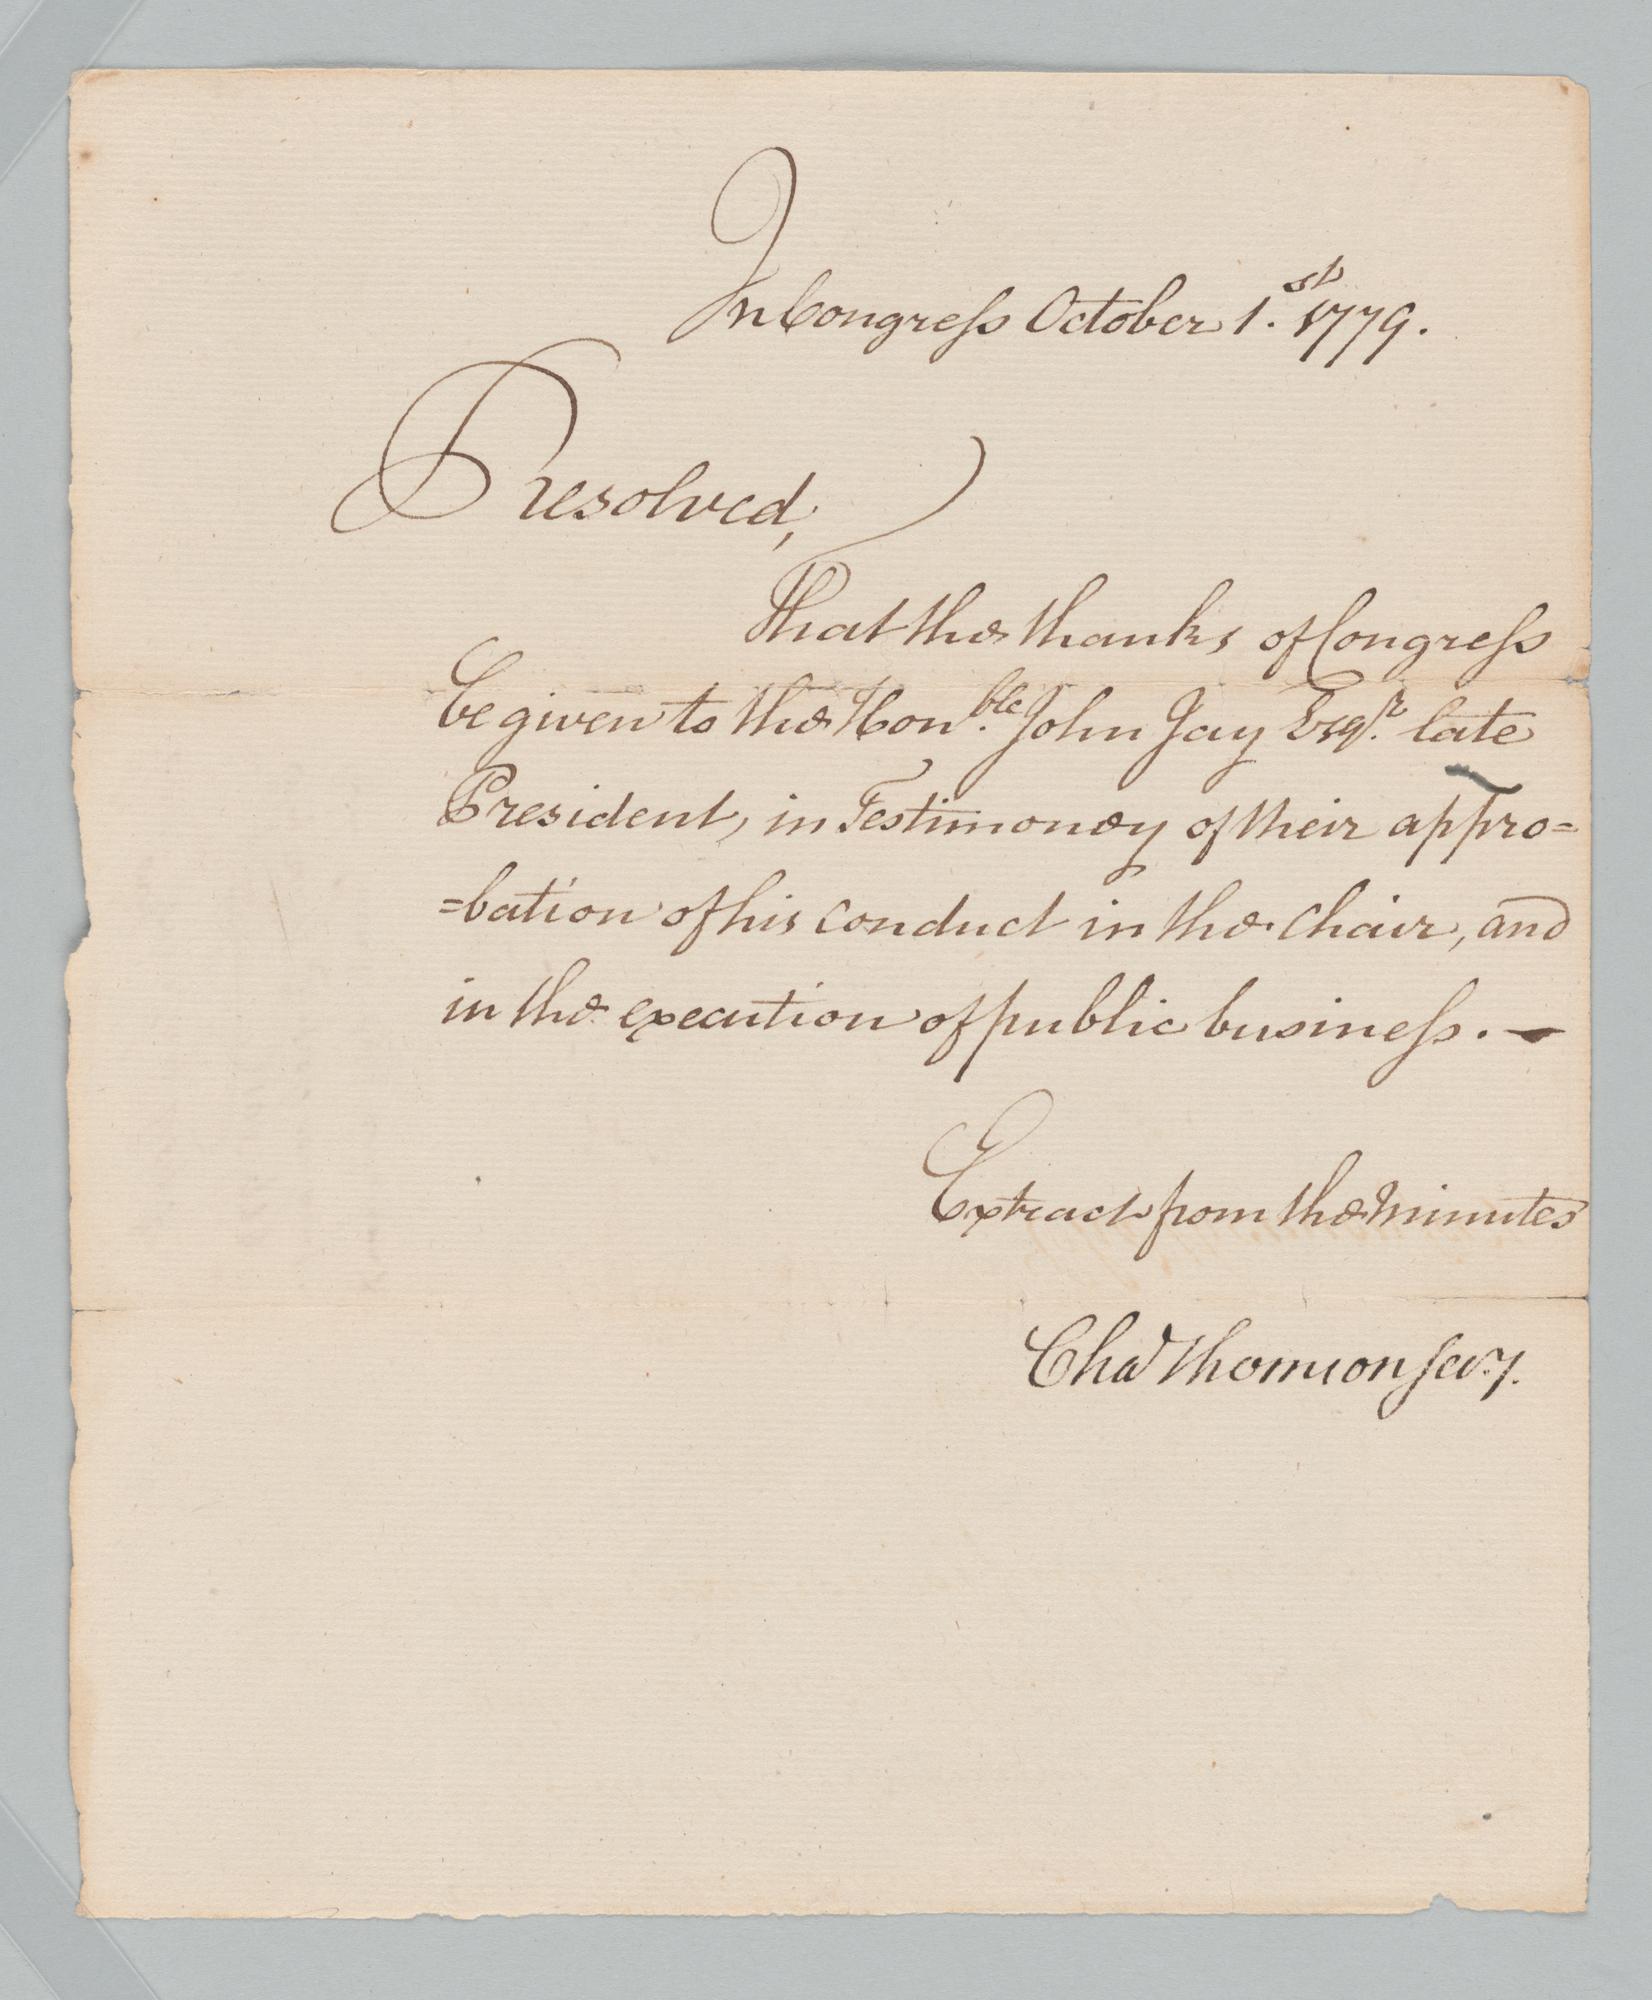 Continental Congress to John Jay, front